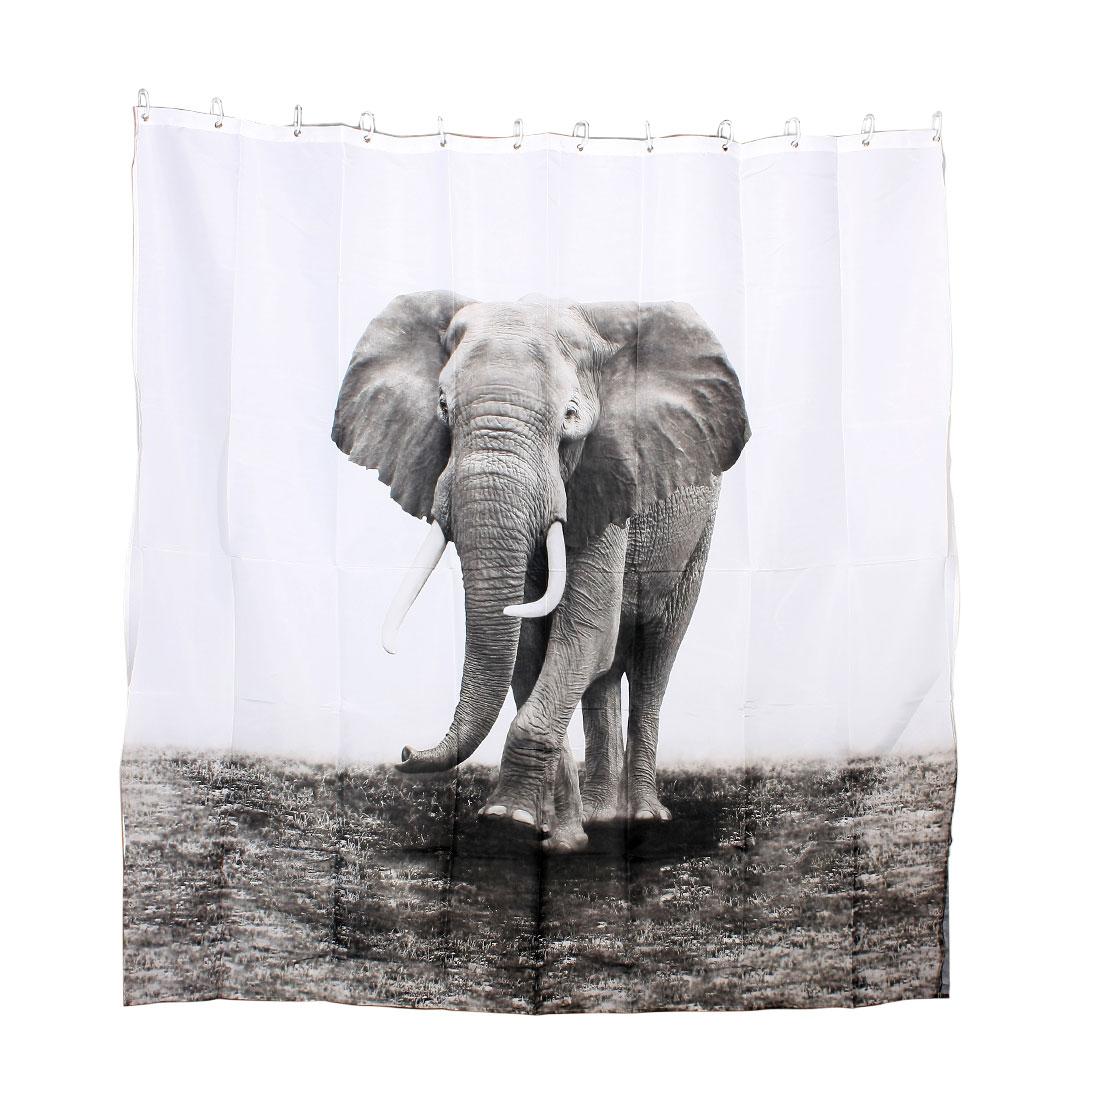 Elephant Pattern Essential Home Furnishing Shower Curtain w 12 Hooks 180 x 180cm